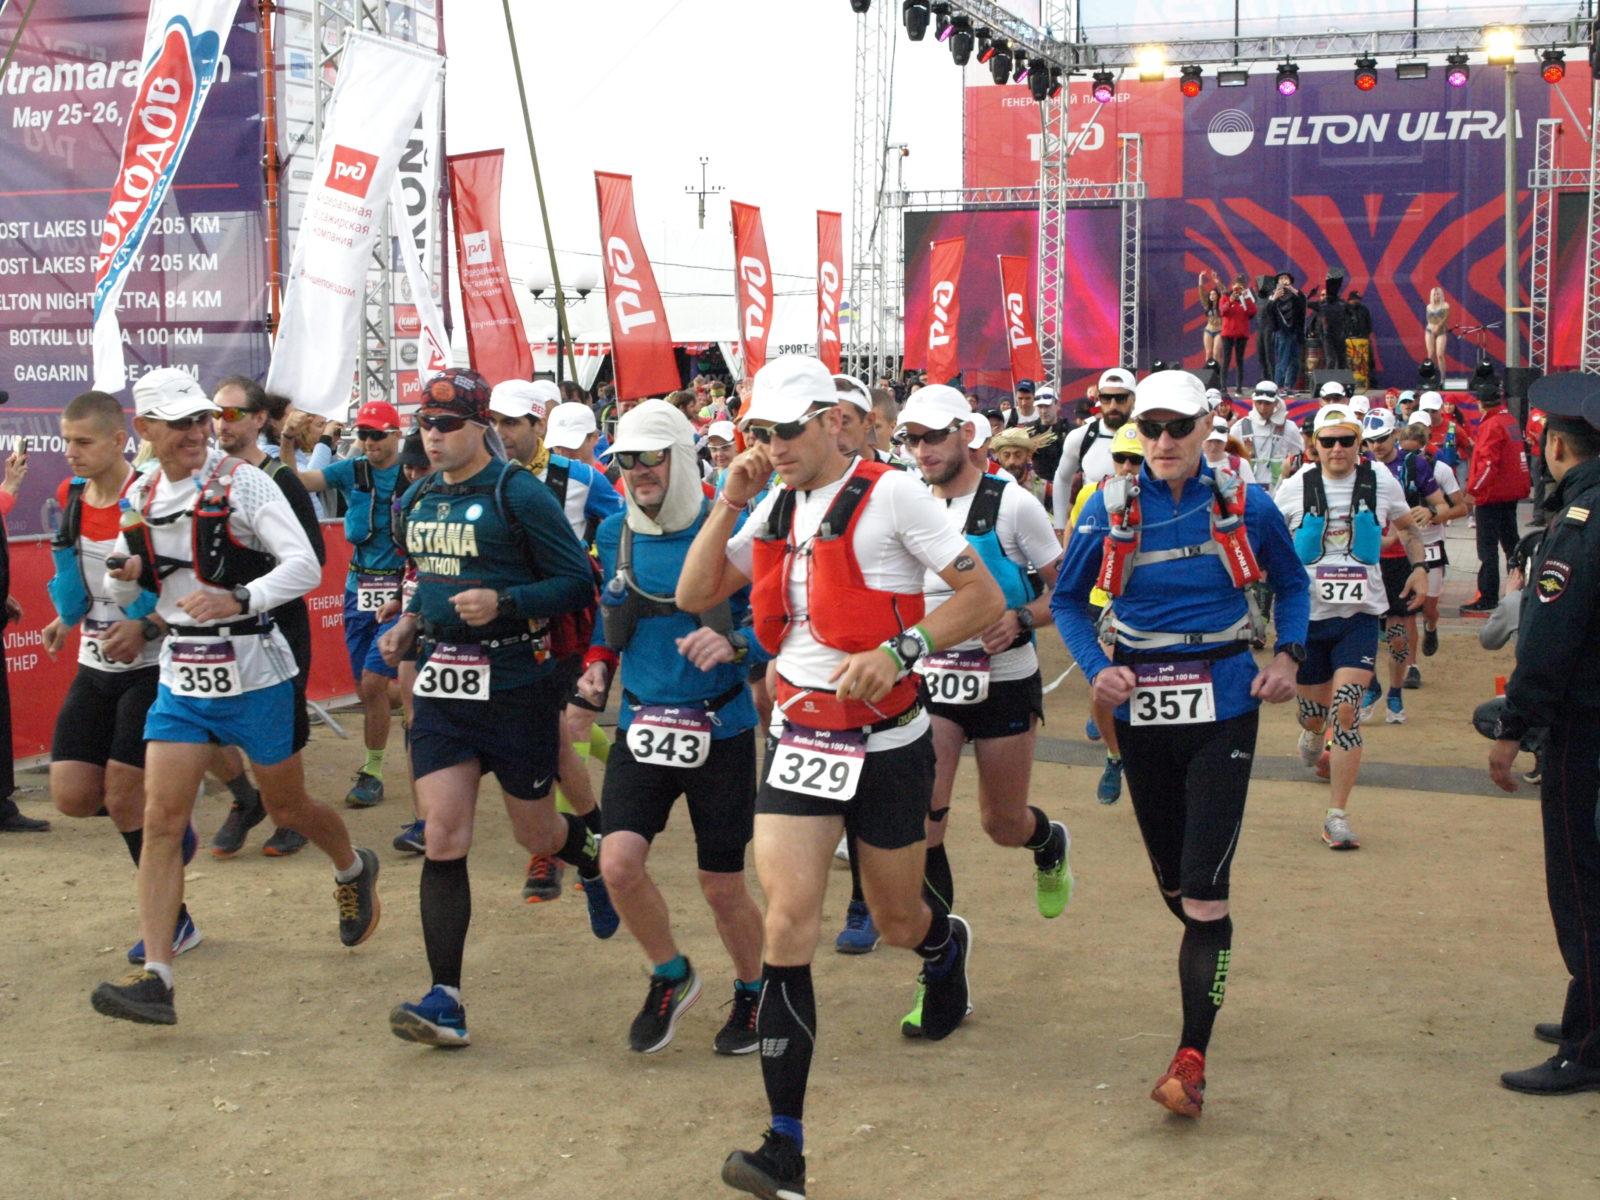 BOTKUL ULTRA 100 KM 2019